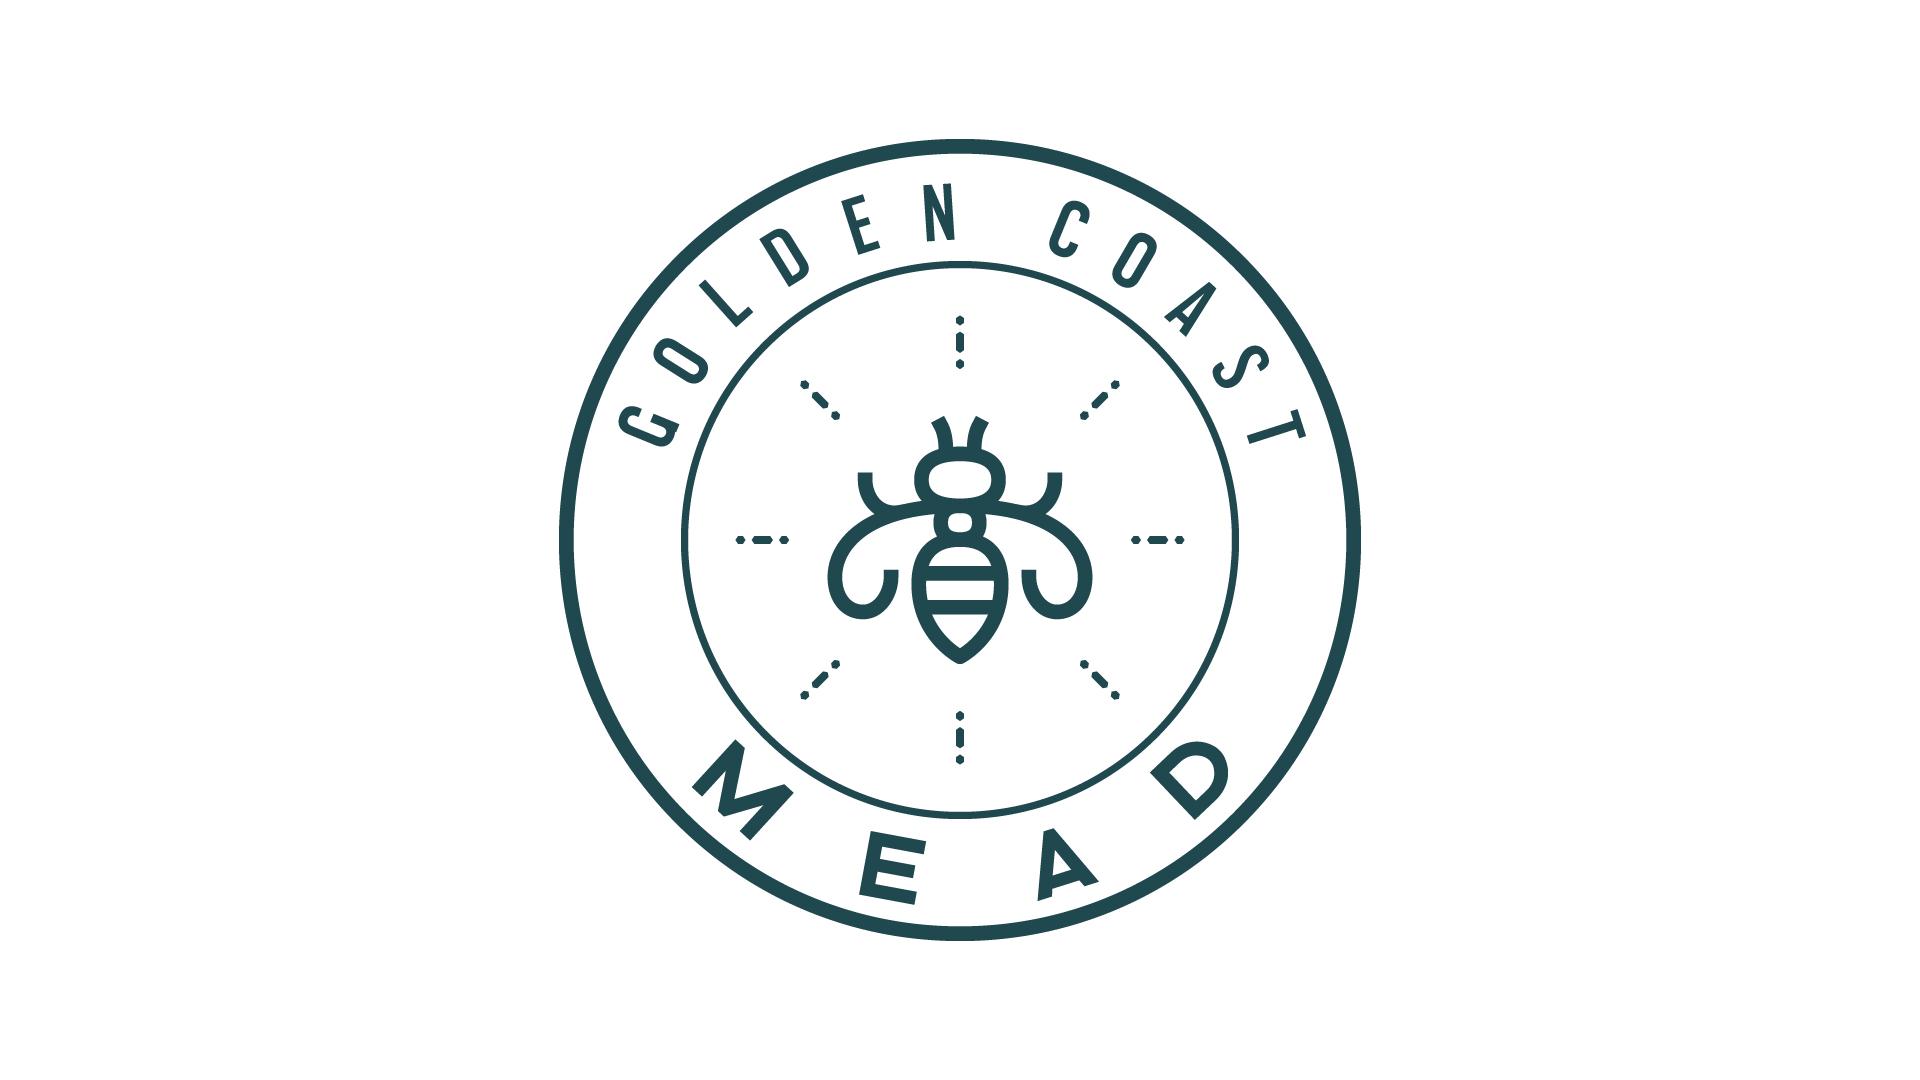 13-golden-coast-mead-circle-icon-blue (1).jpg